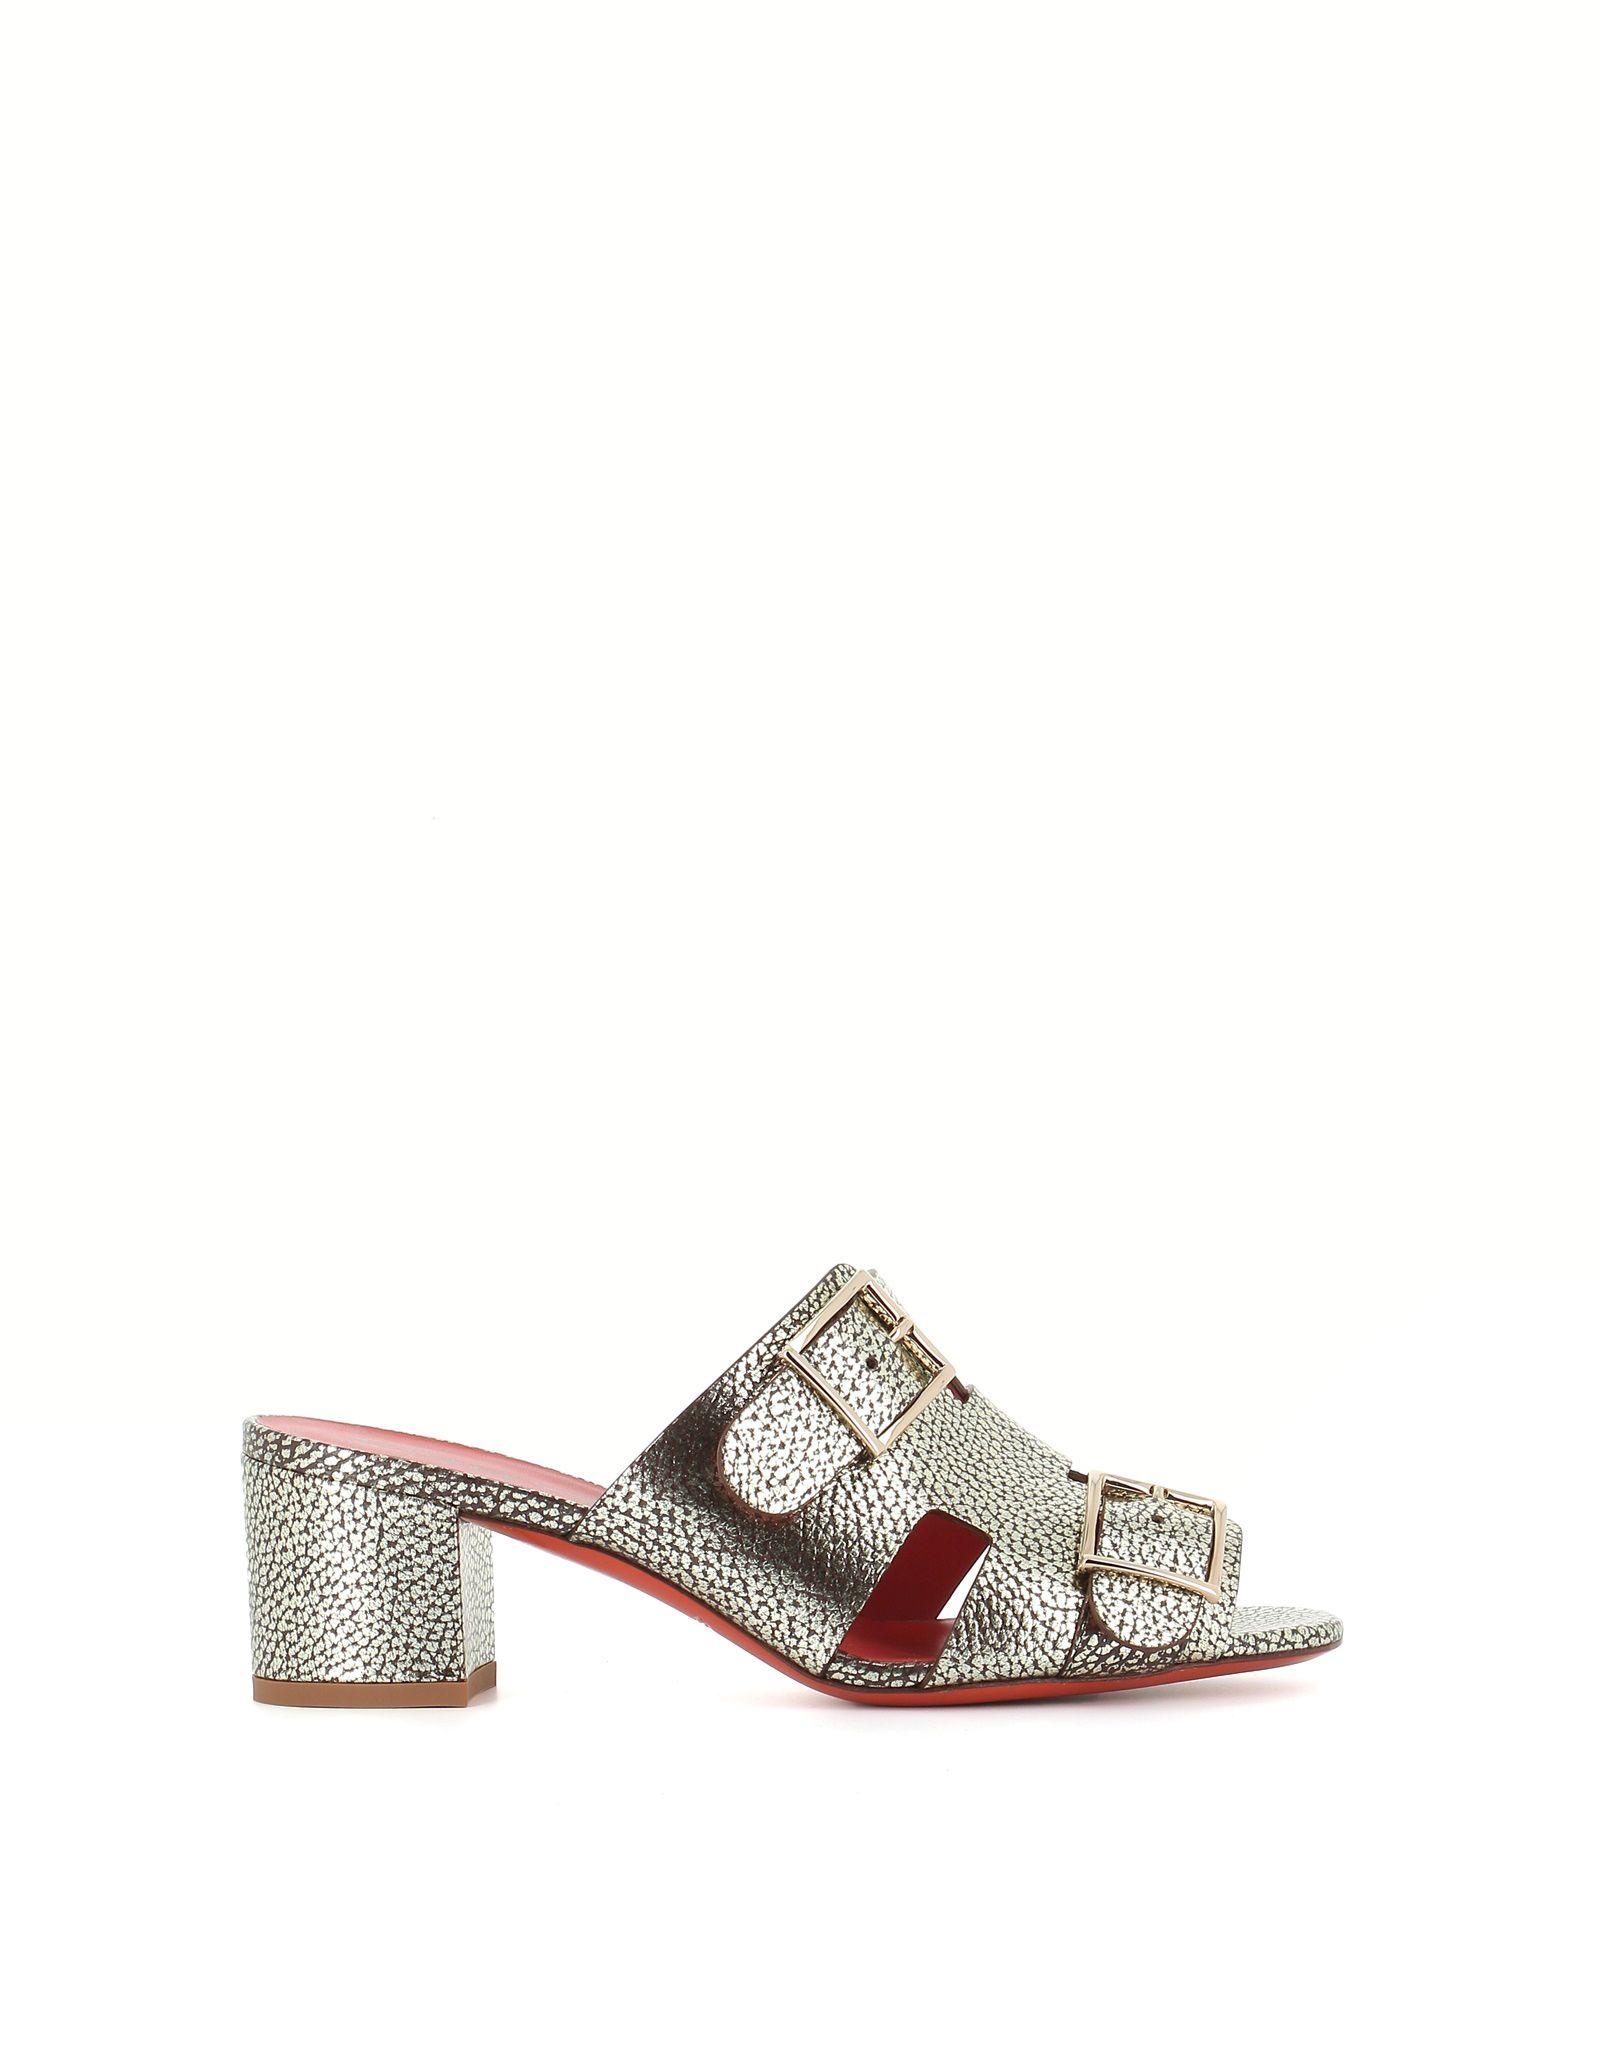 Santoni Buckle Sandals